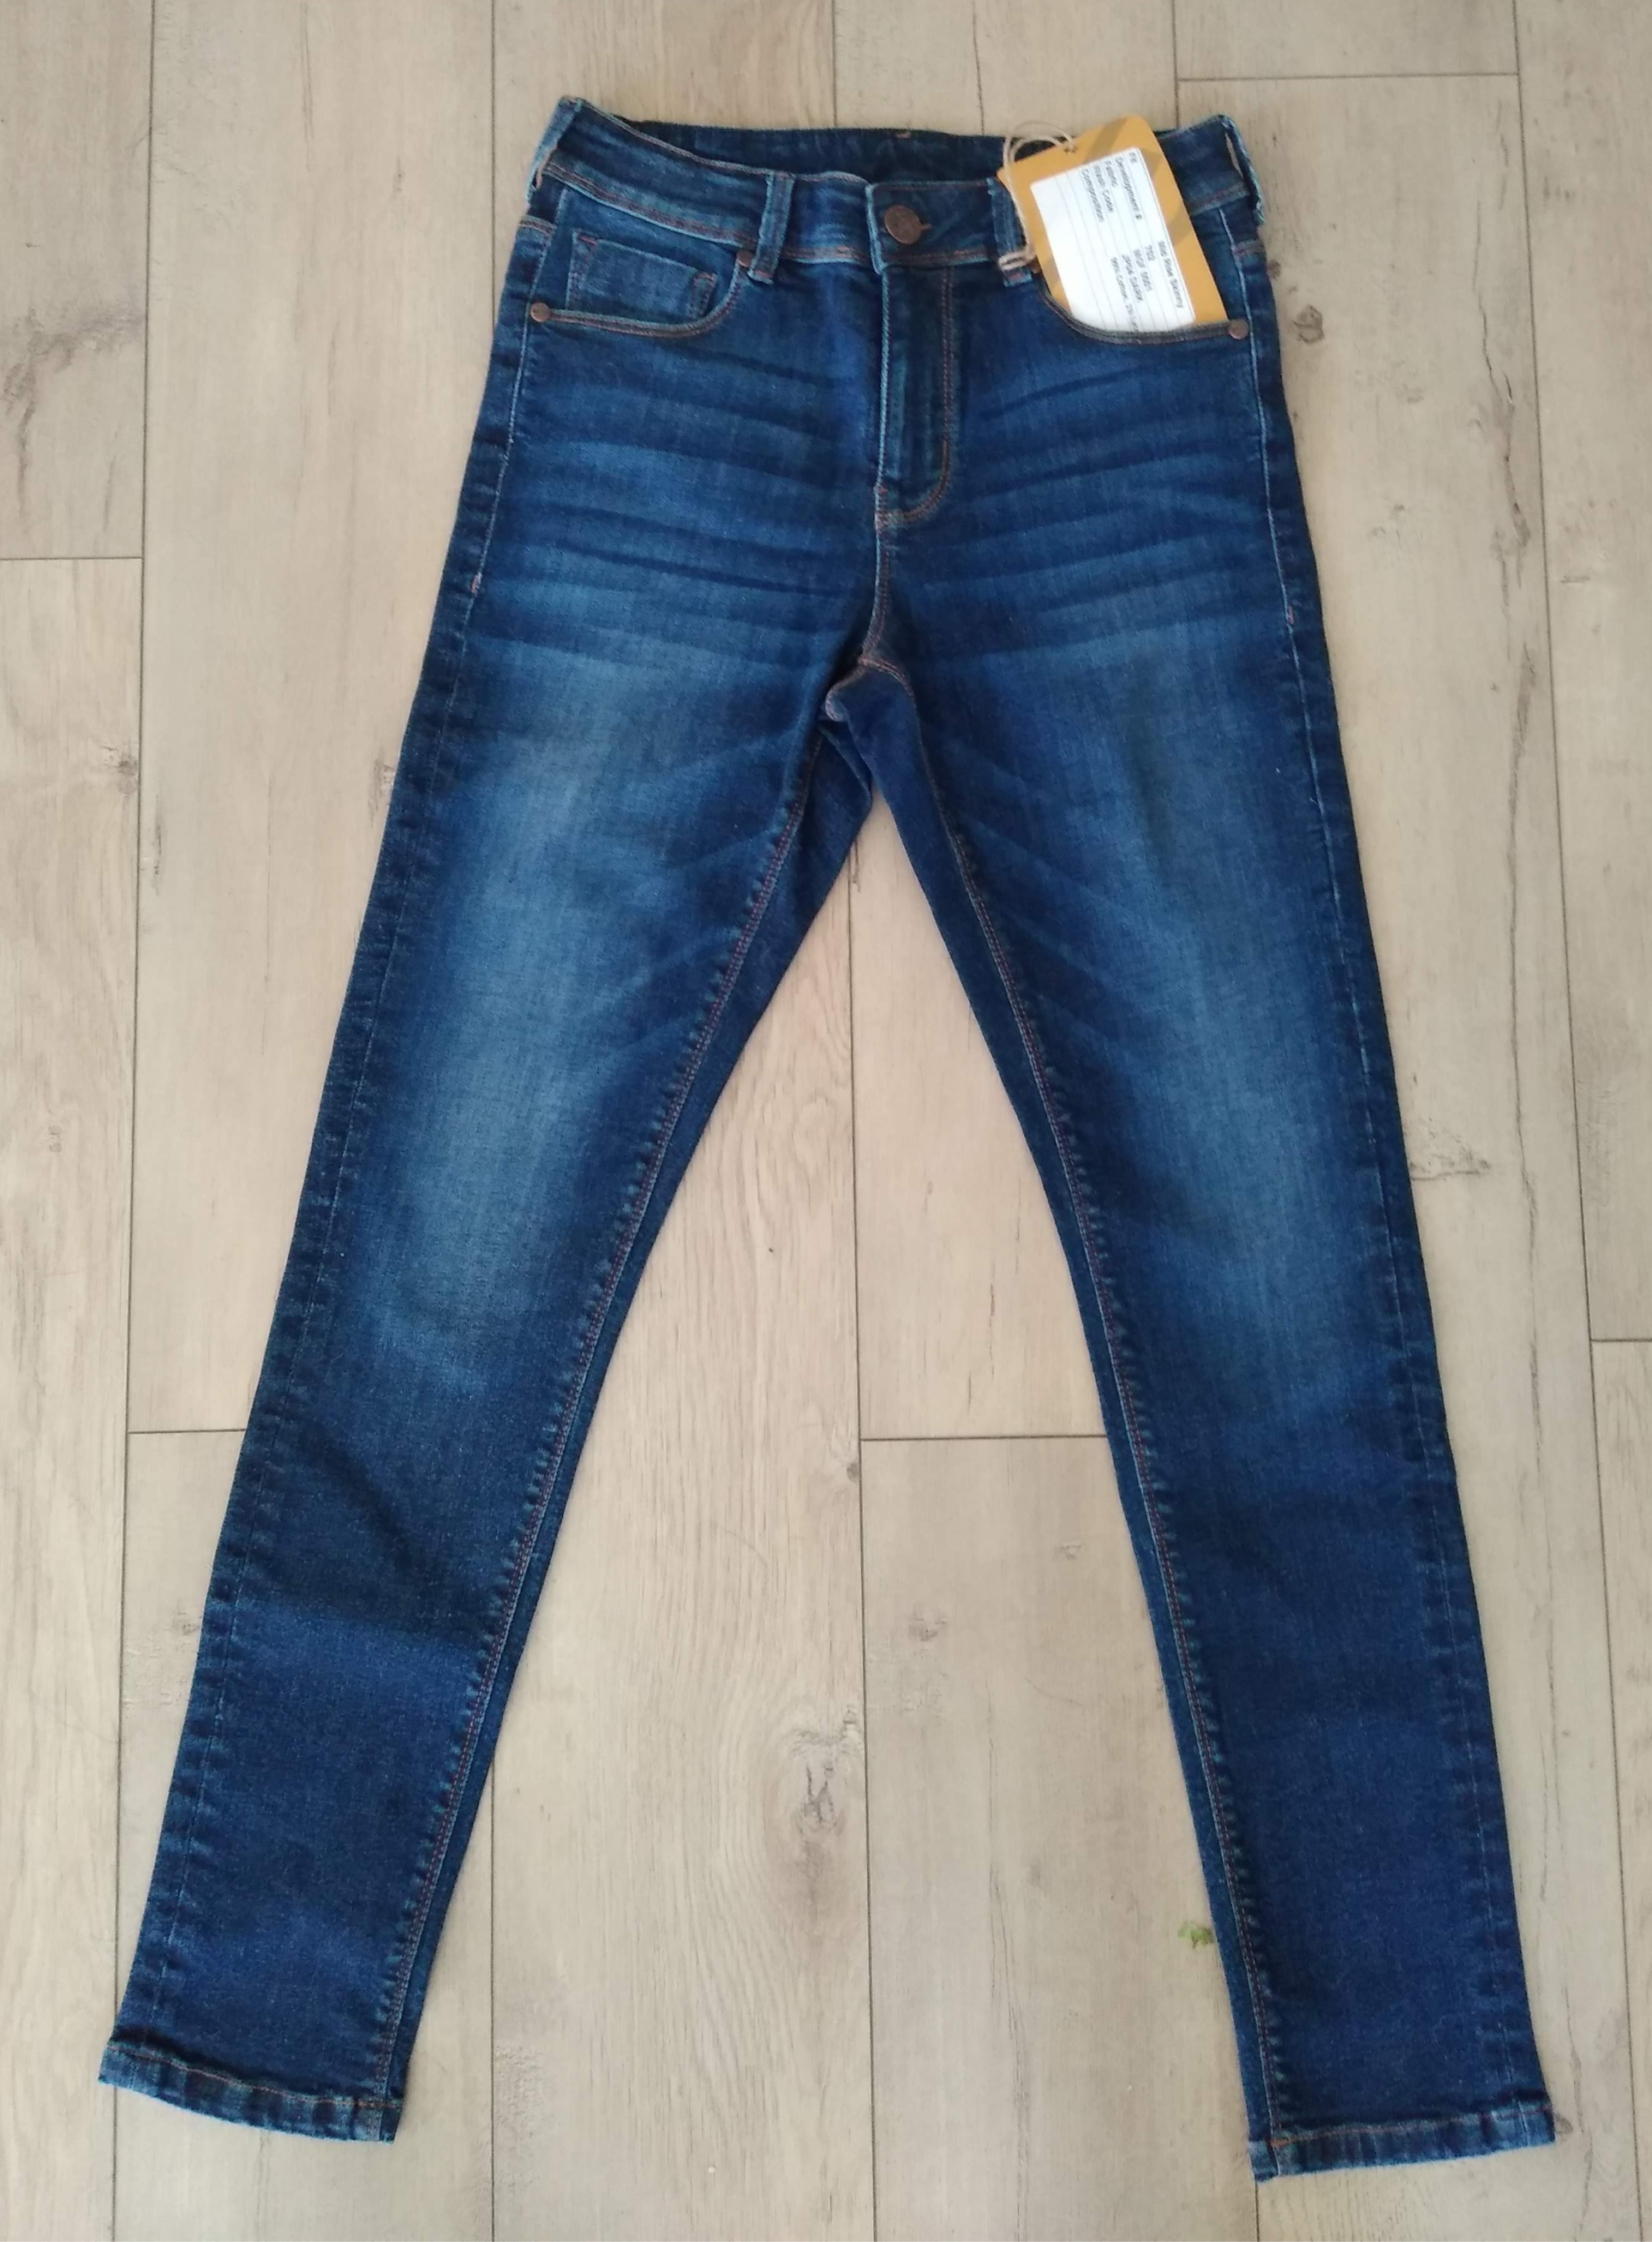 Womens premium jeans